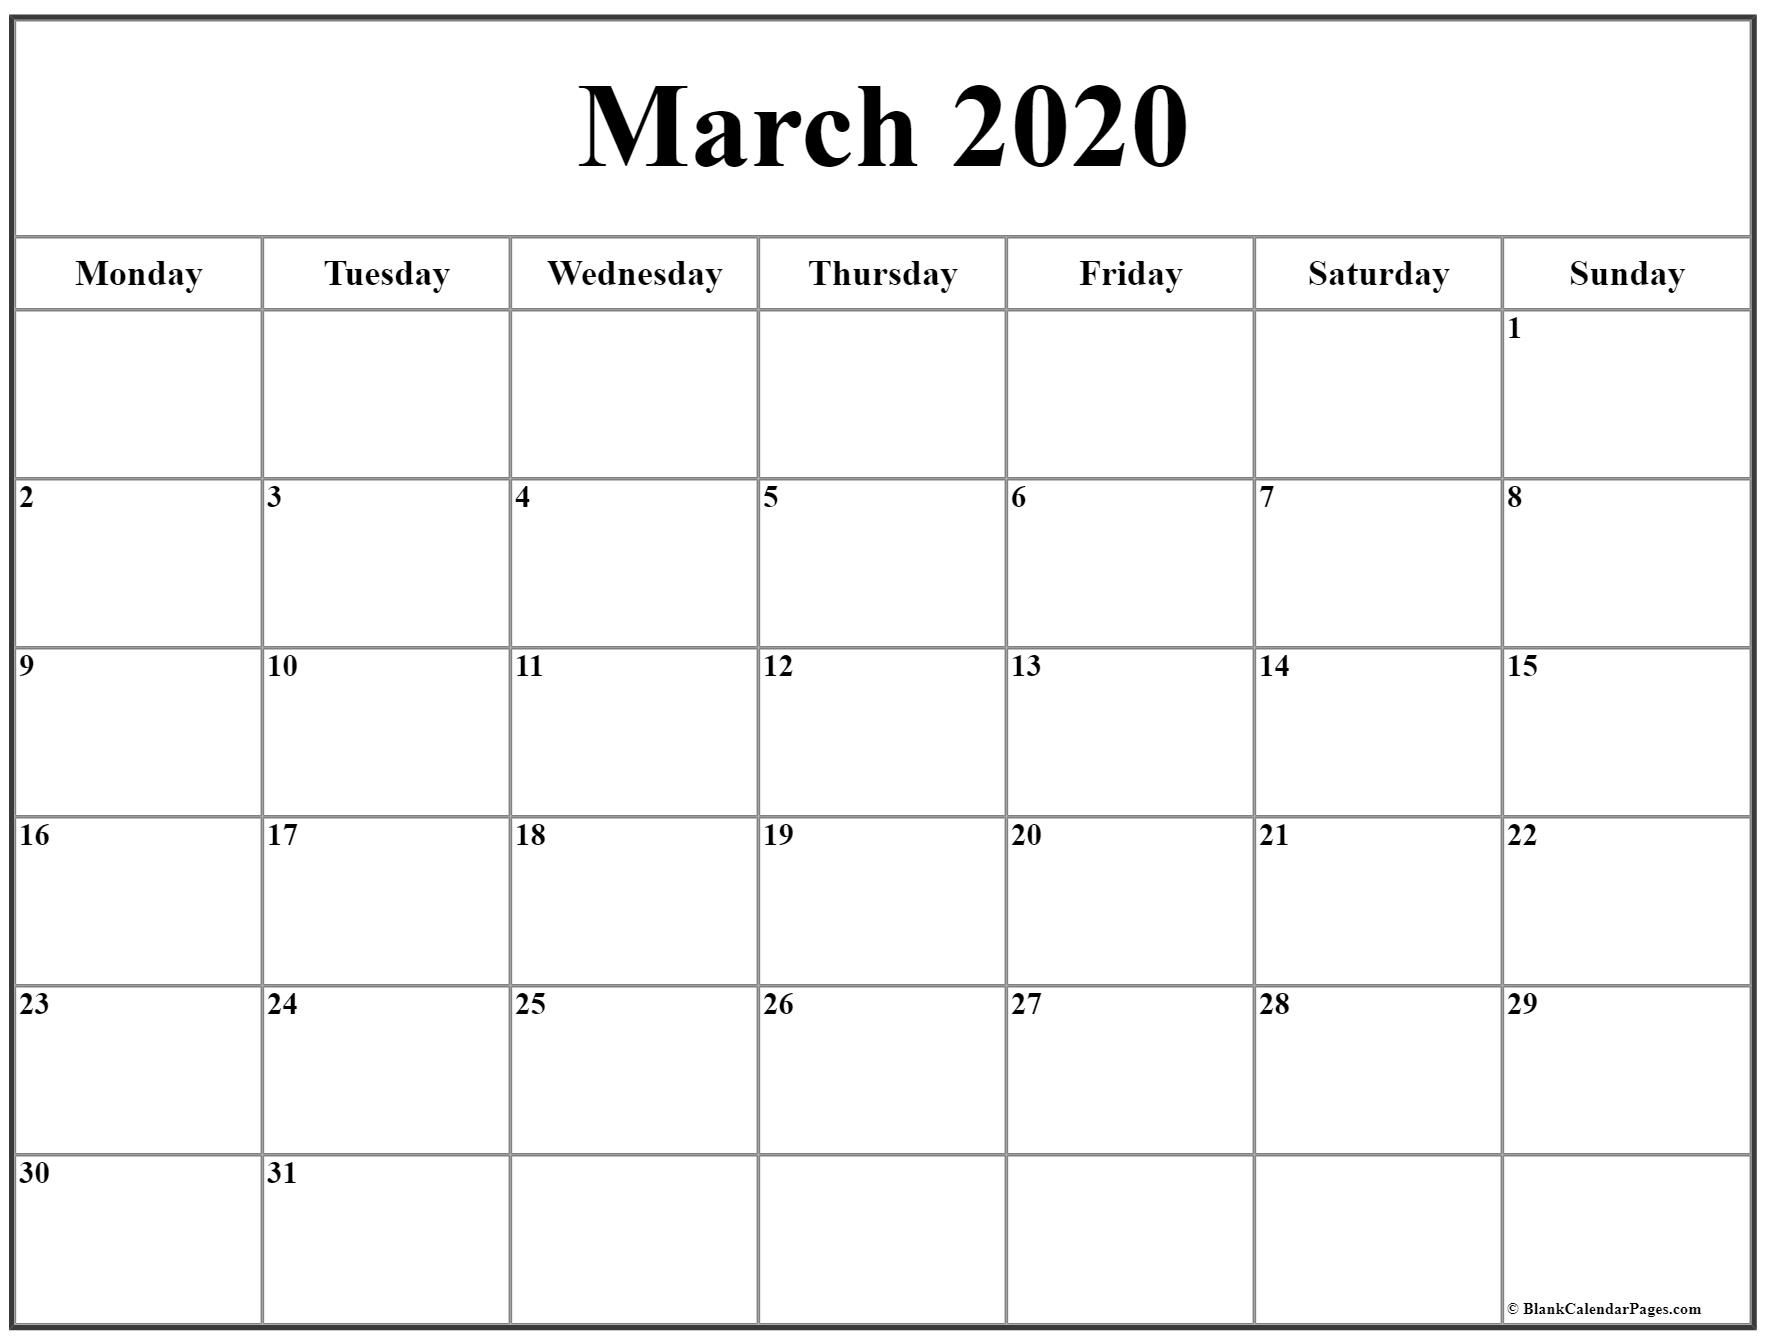 March 2020 Monday Calendar   Monday To Sunday